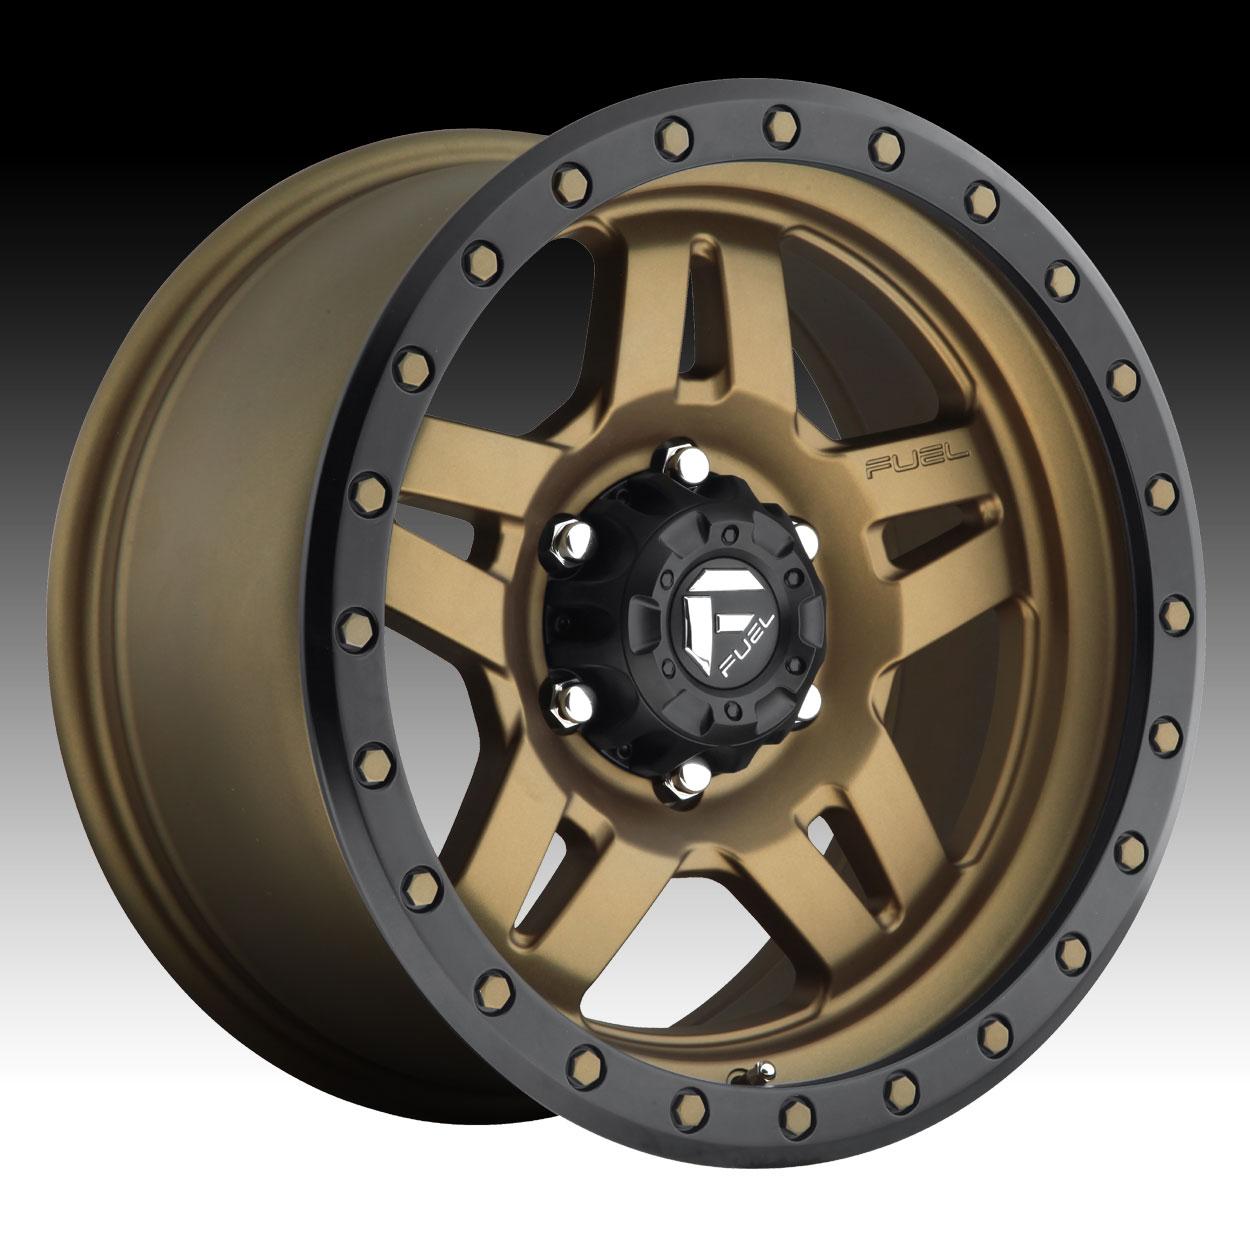 Truck Wheels Rims : Fuel anza d matte bronze w black ring custom truck